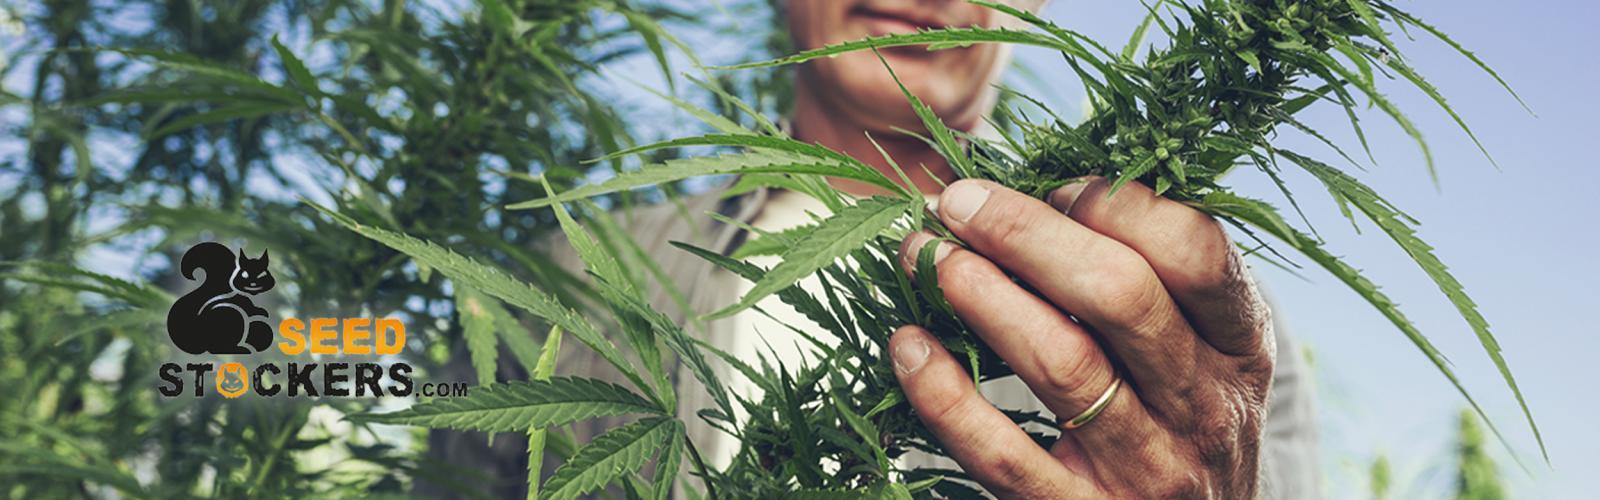 Semillas de Marihuana CBD Seedstockers